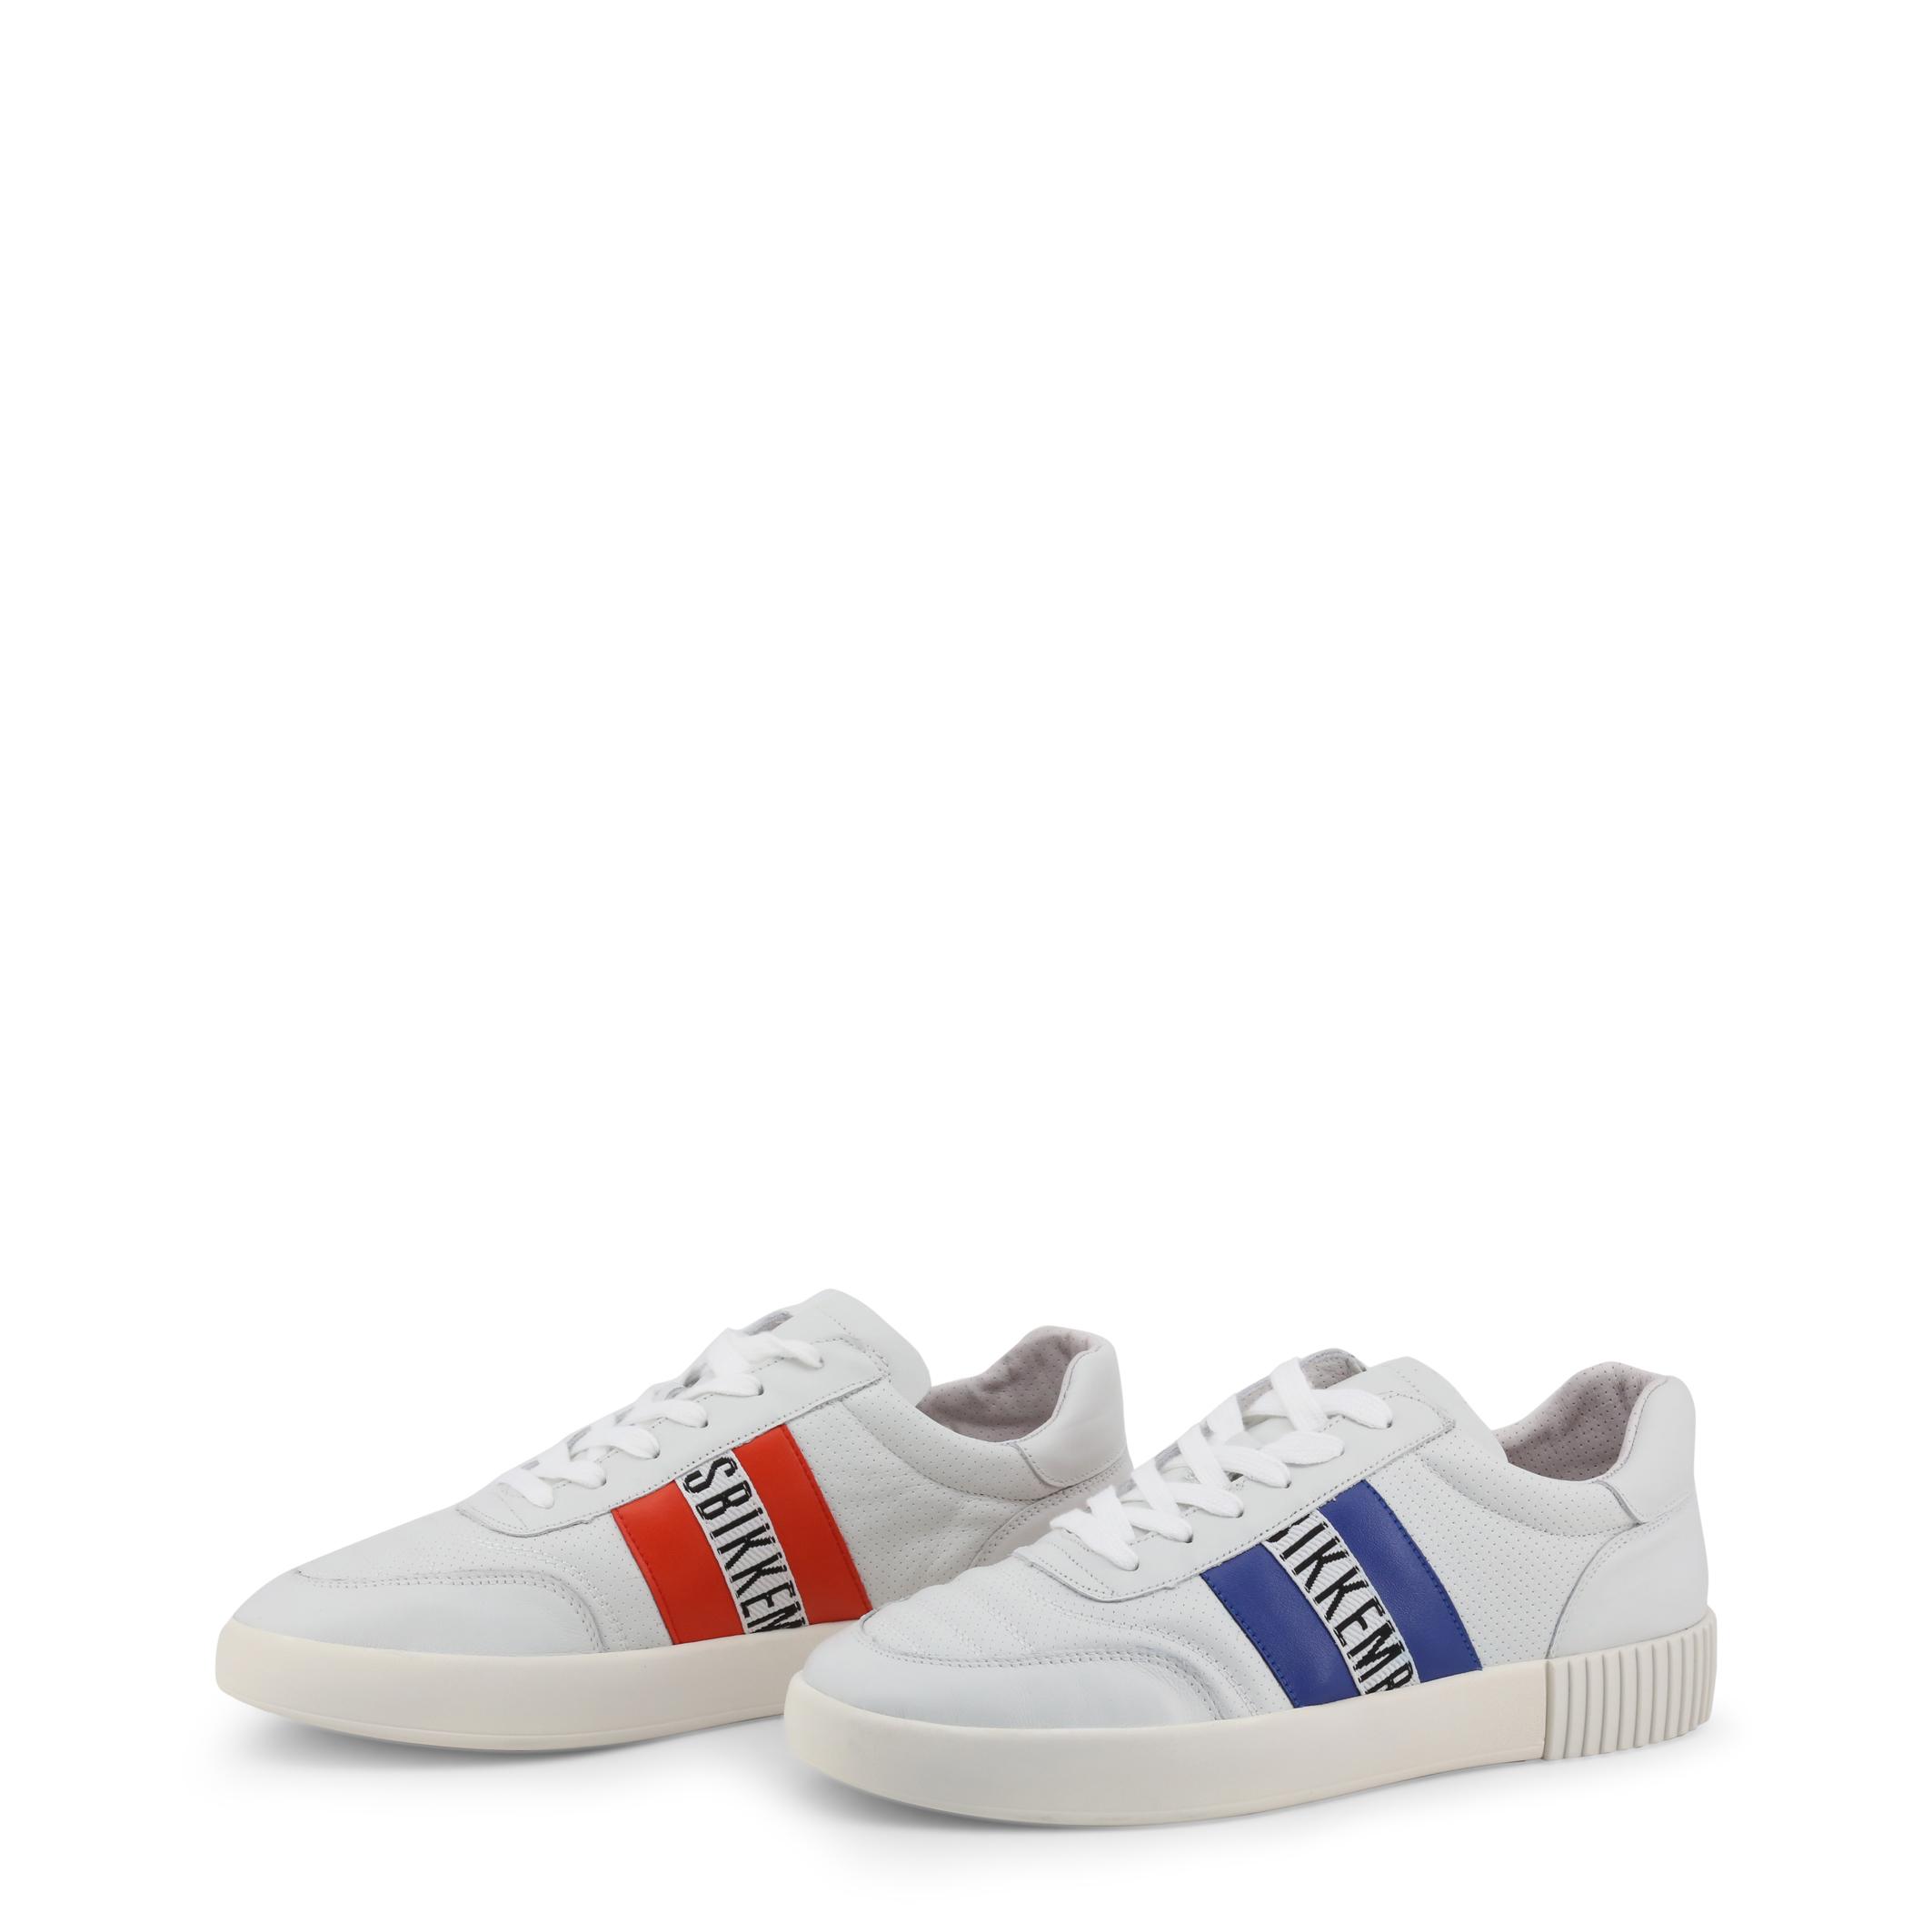 Chaussures de ville  Bikkembergs COSMOS_2382 white